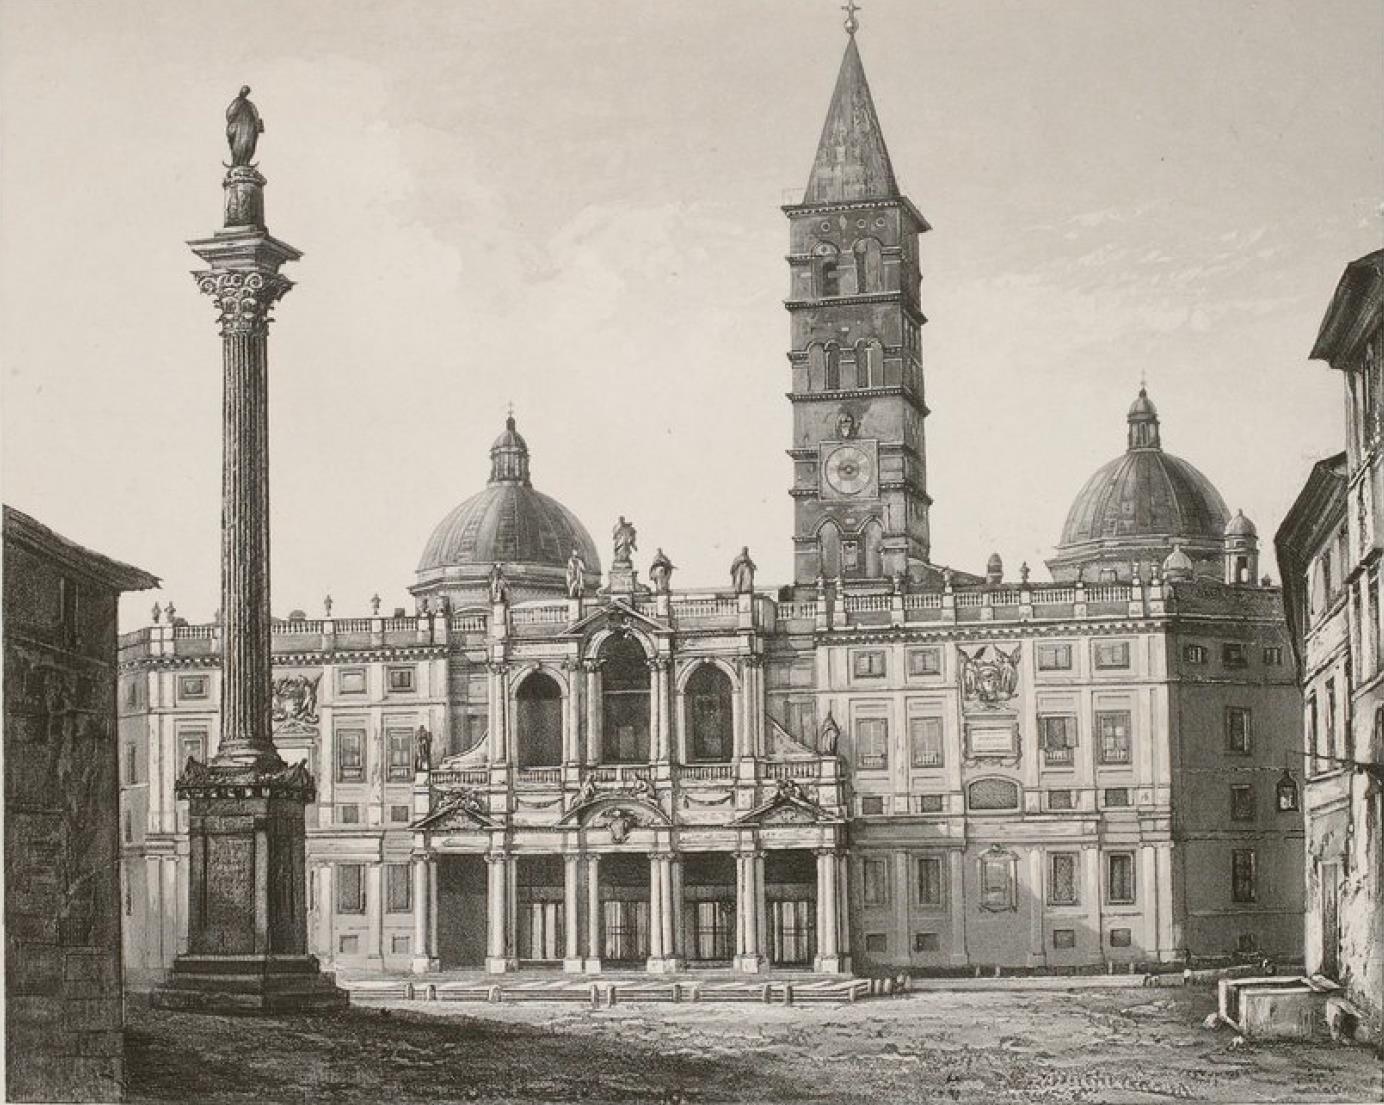 Италия. Рим. Церковь Санта-Мария-Маджоре